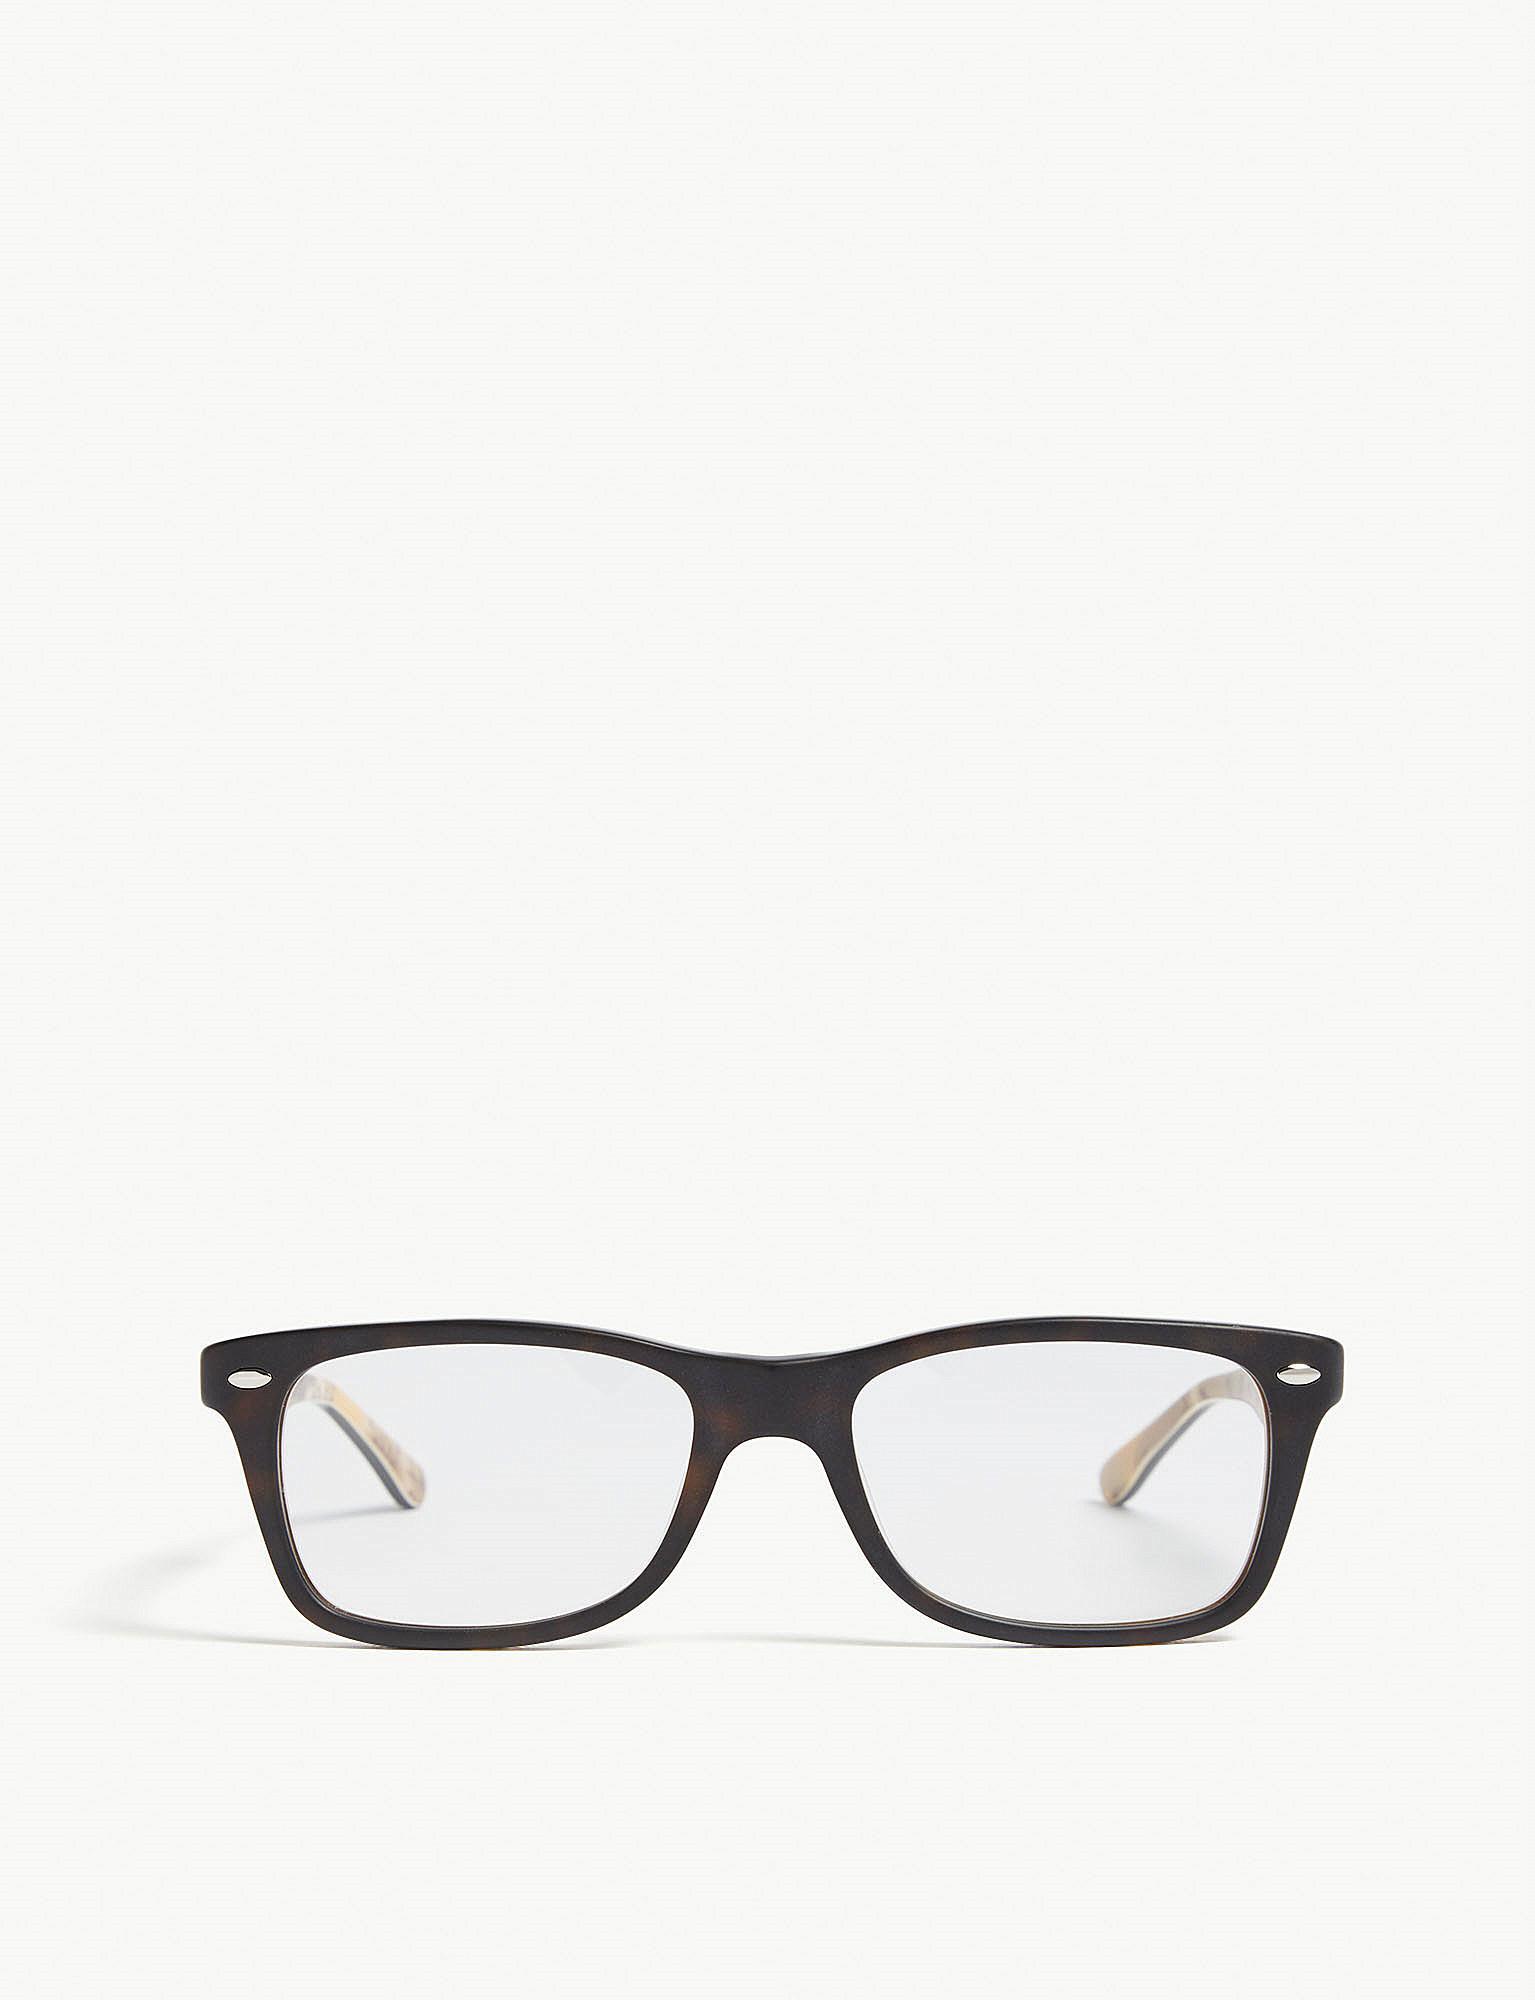 9beef7d0fdd Ray-Ban Rb5228 Square-frame Havana Glasses in Black for Men - Lyst